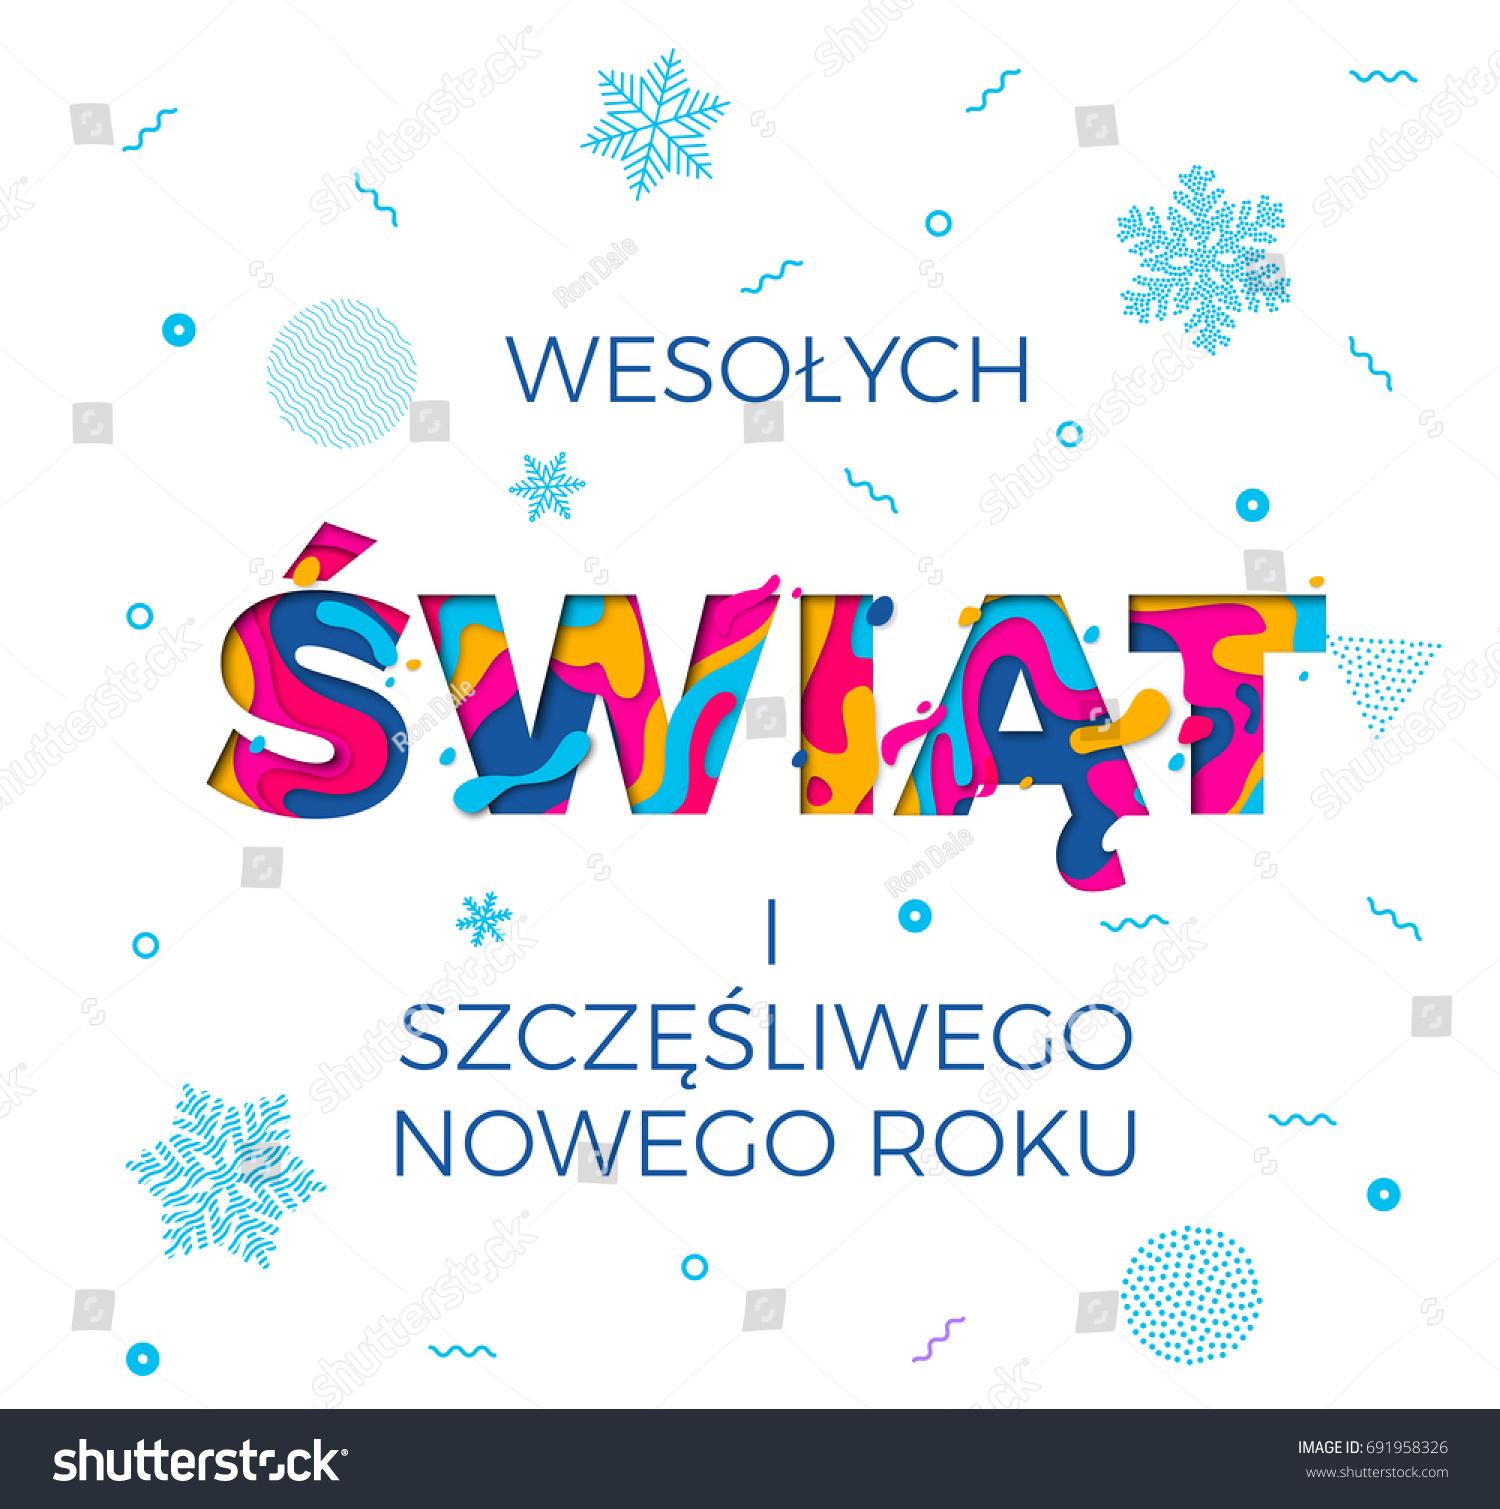 Wesolych Swiat Merry Christmas Nowego Roku Stock Vector (Royalty ...